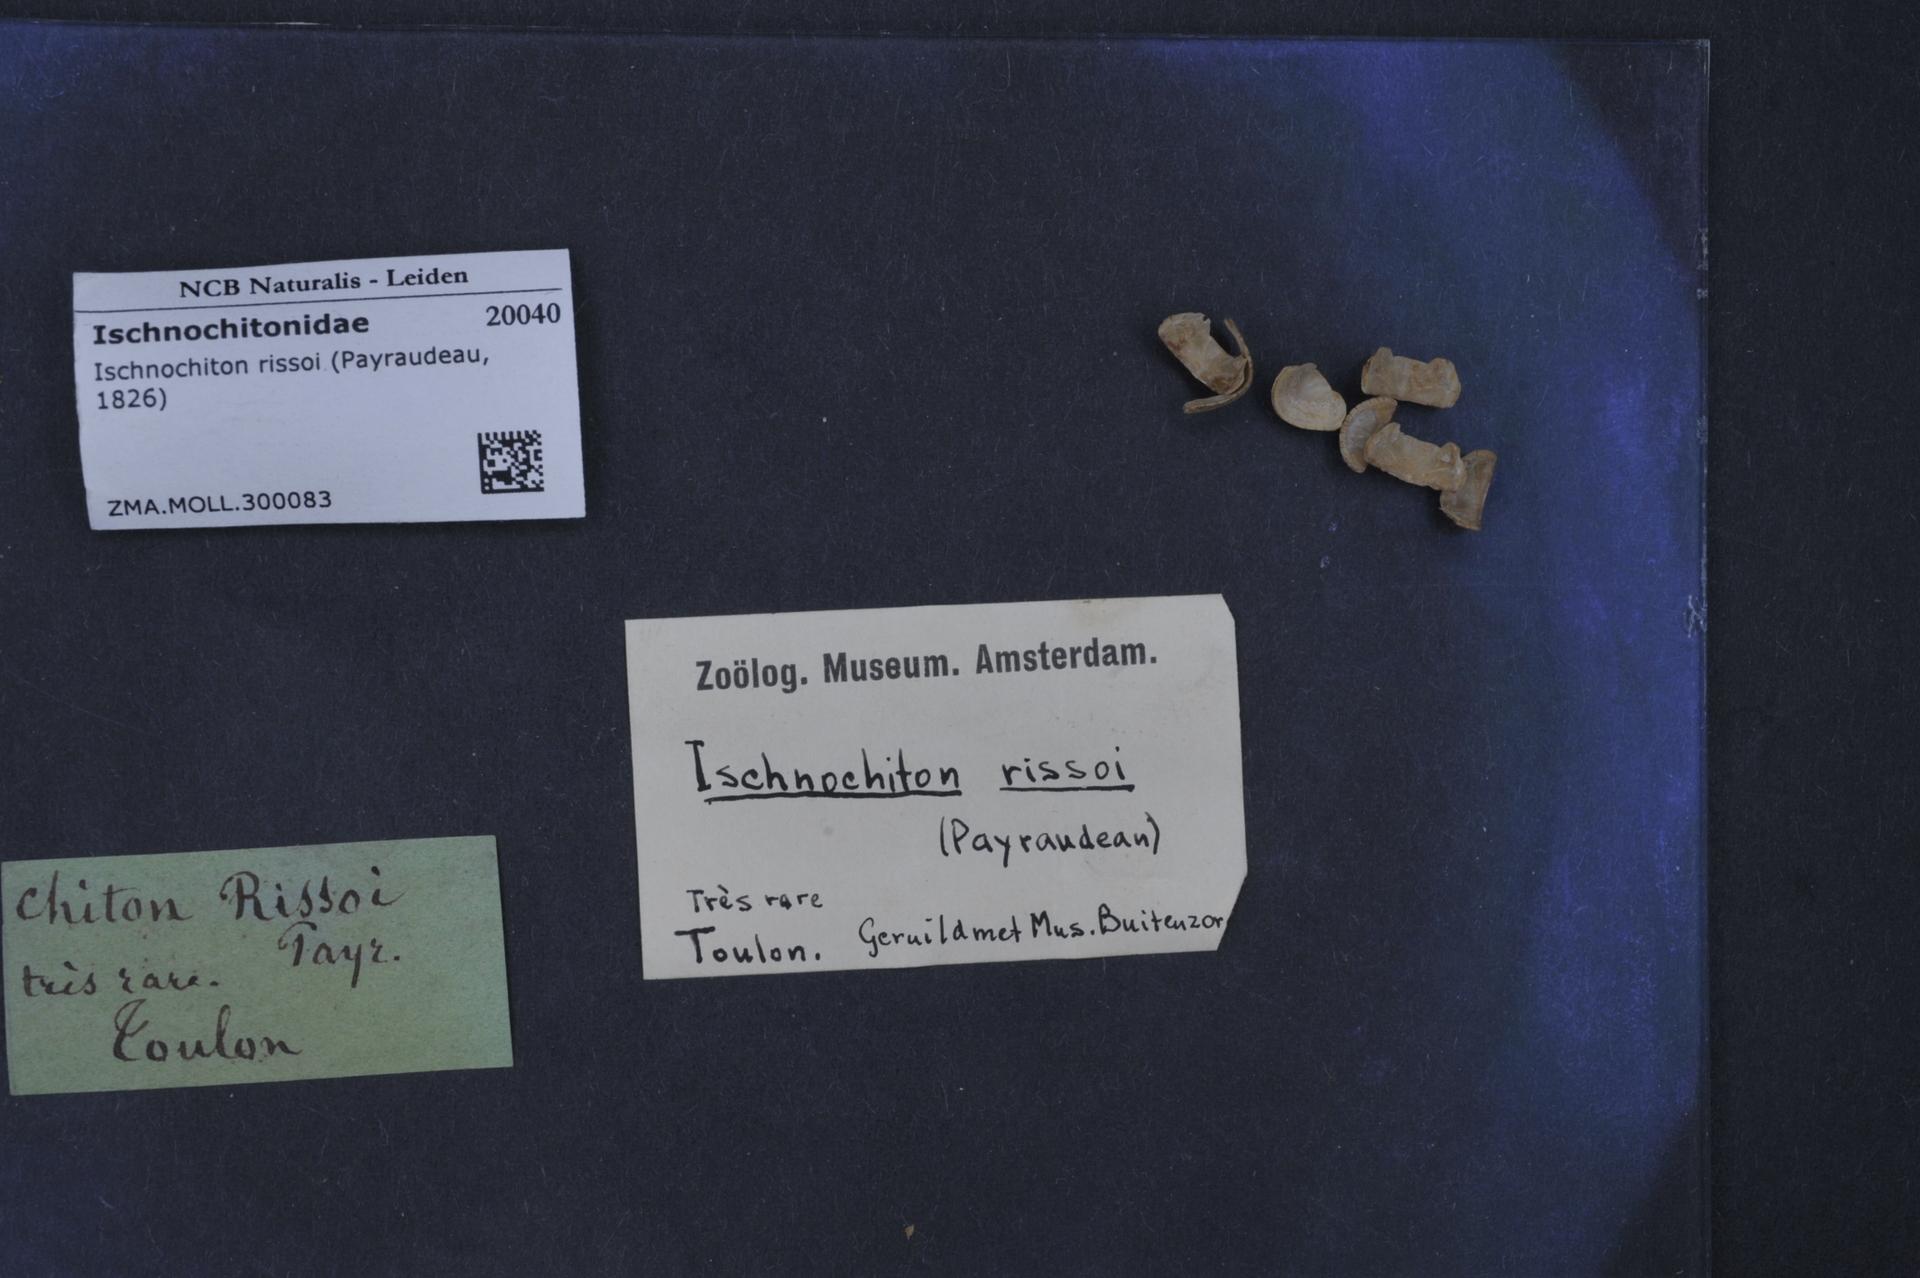 ZMA.MOLL.300083 | Ischnochiton rissoi (Payraudeau, 1826)